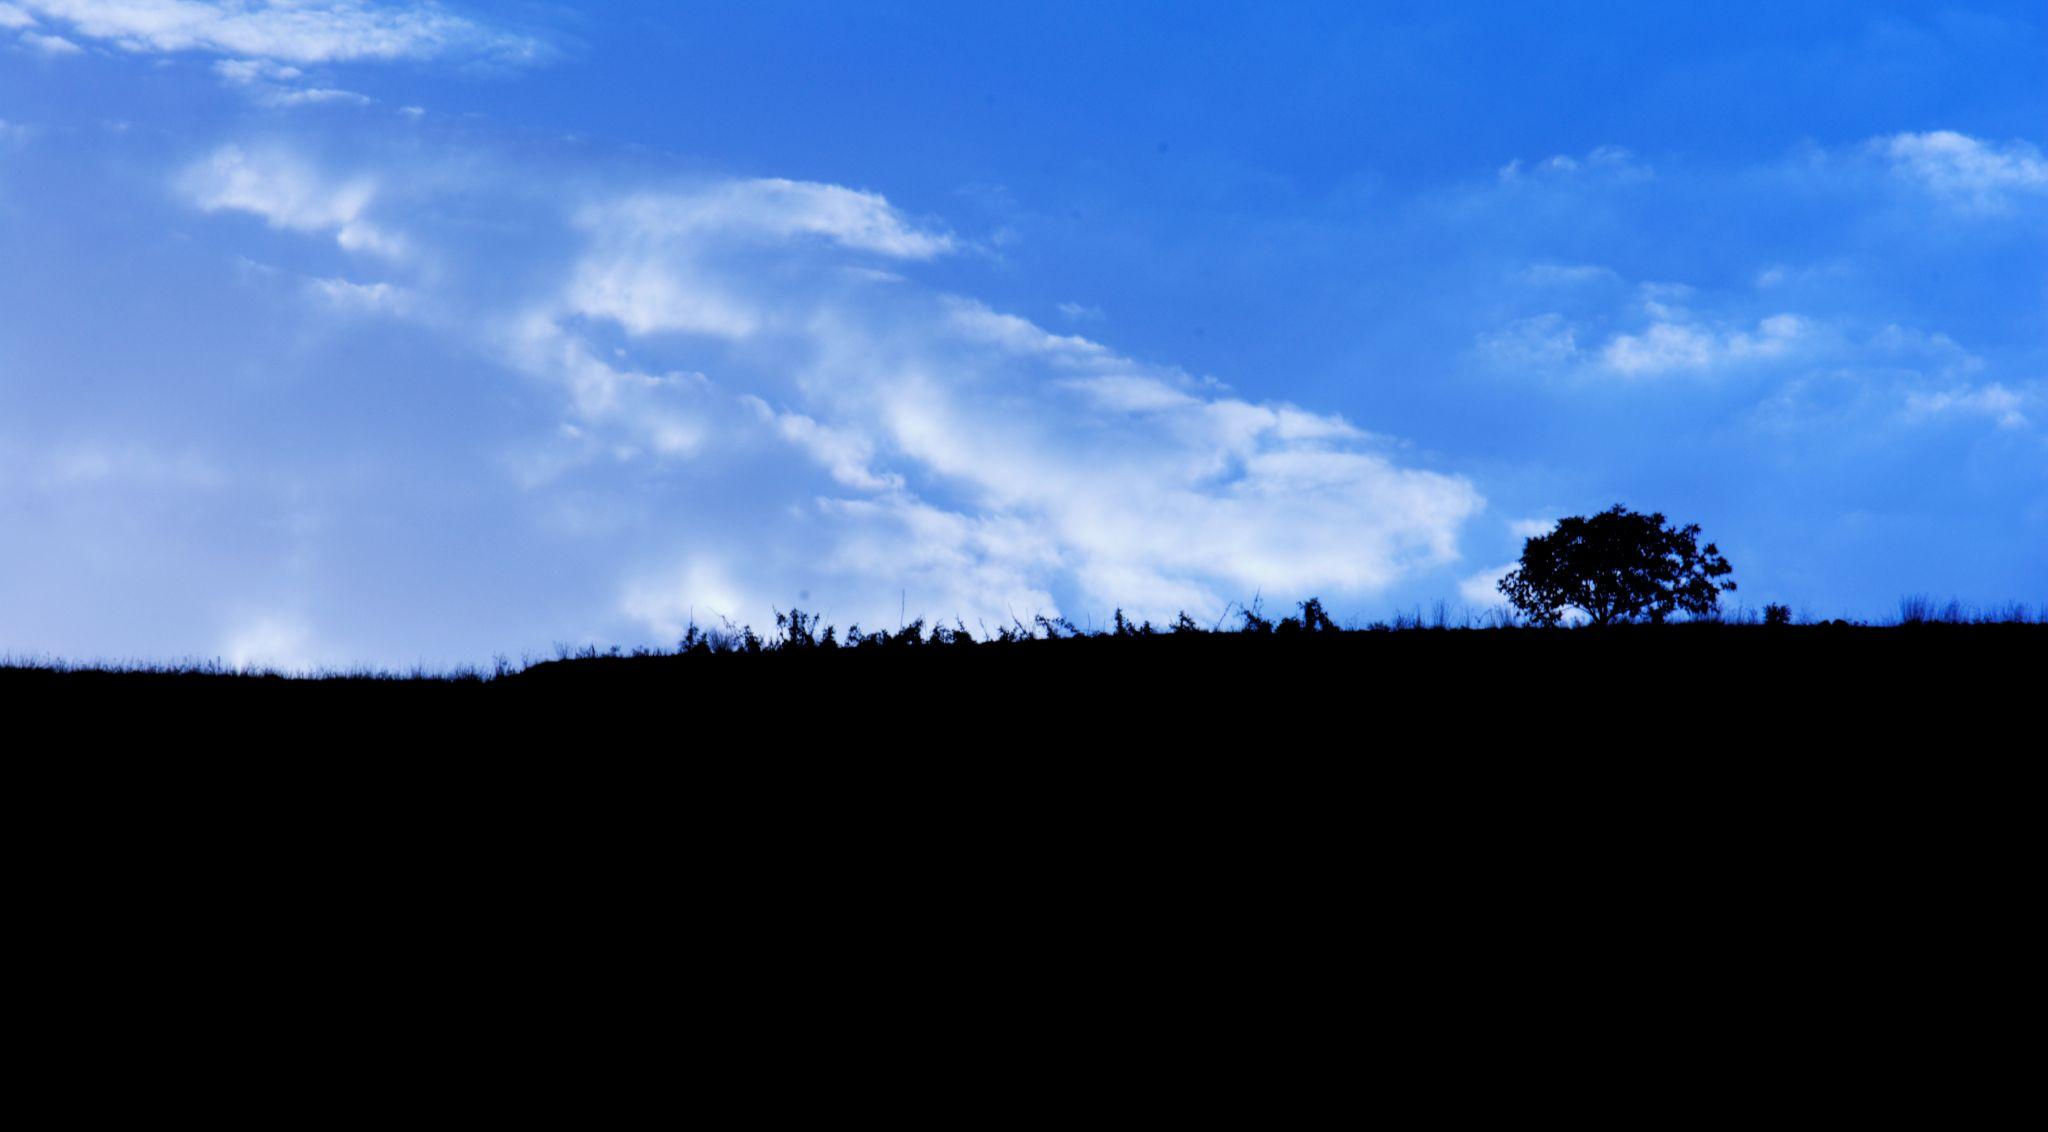 Simple Land by Poya Raissi